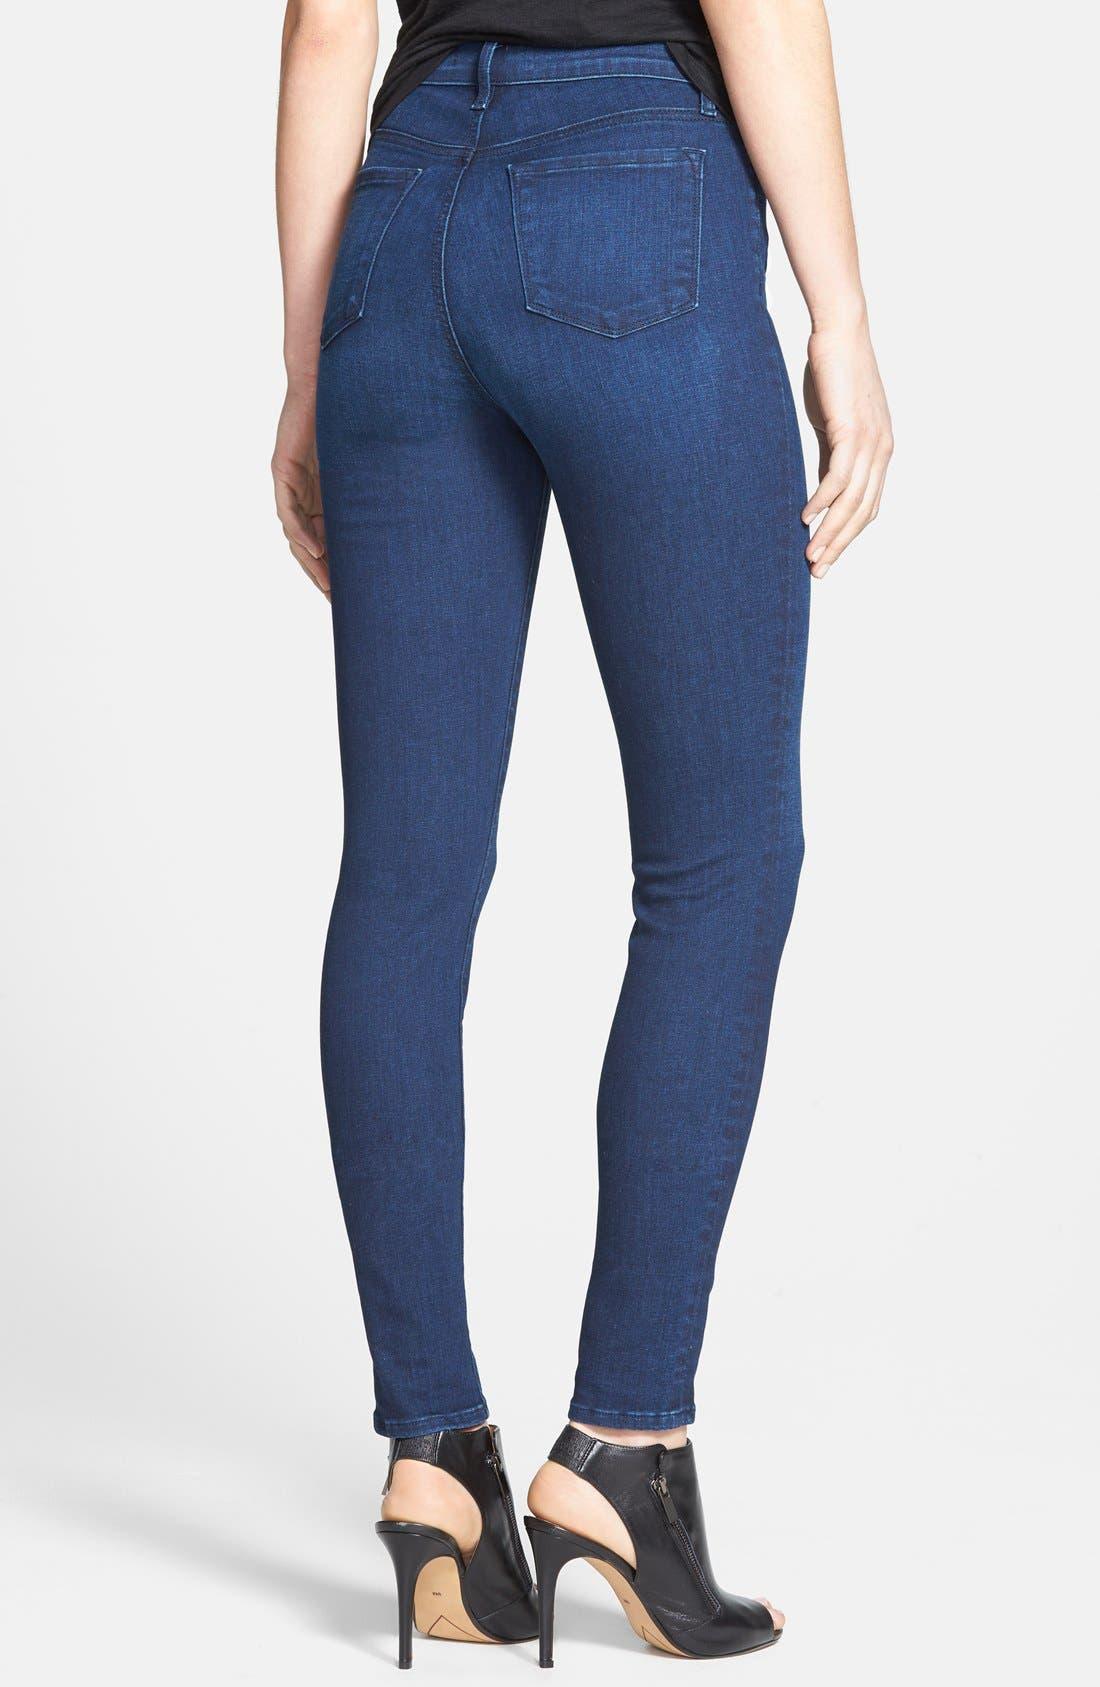 J BRAND,                             'Maria' High Rise Skinny Jeans,                             Alternate thumbnail 3, color,                             400